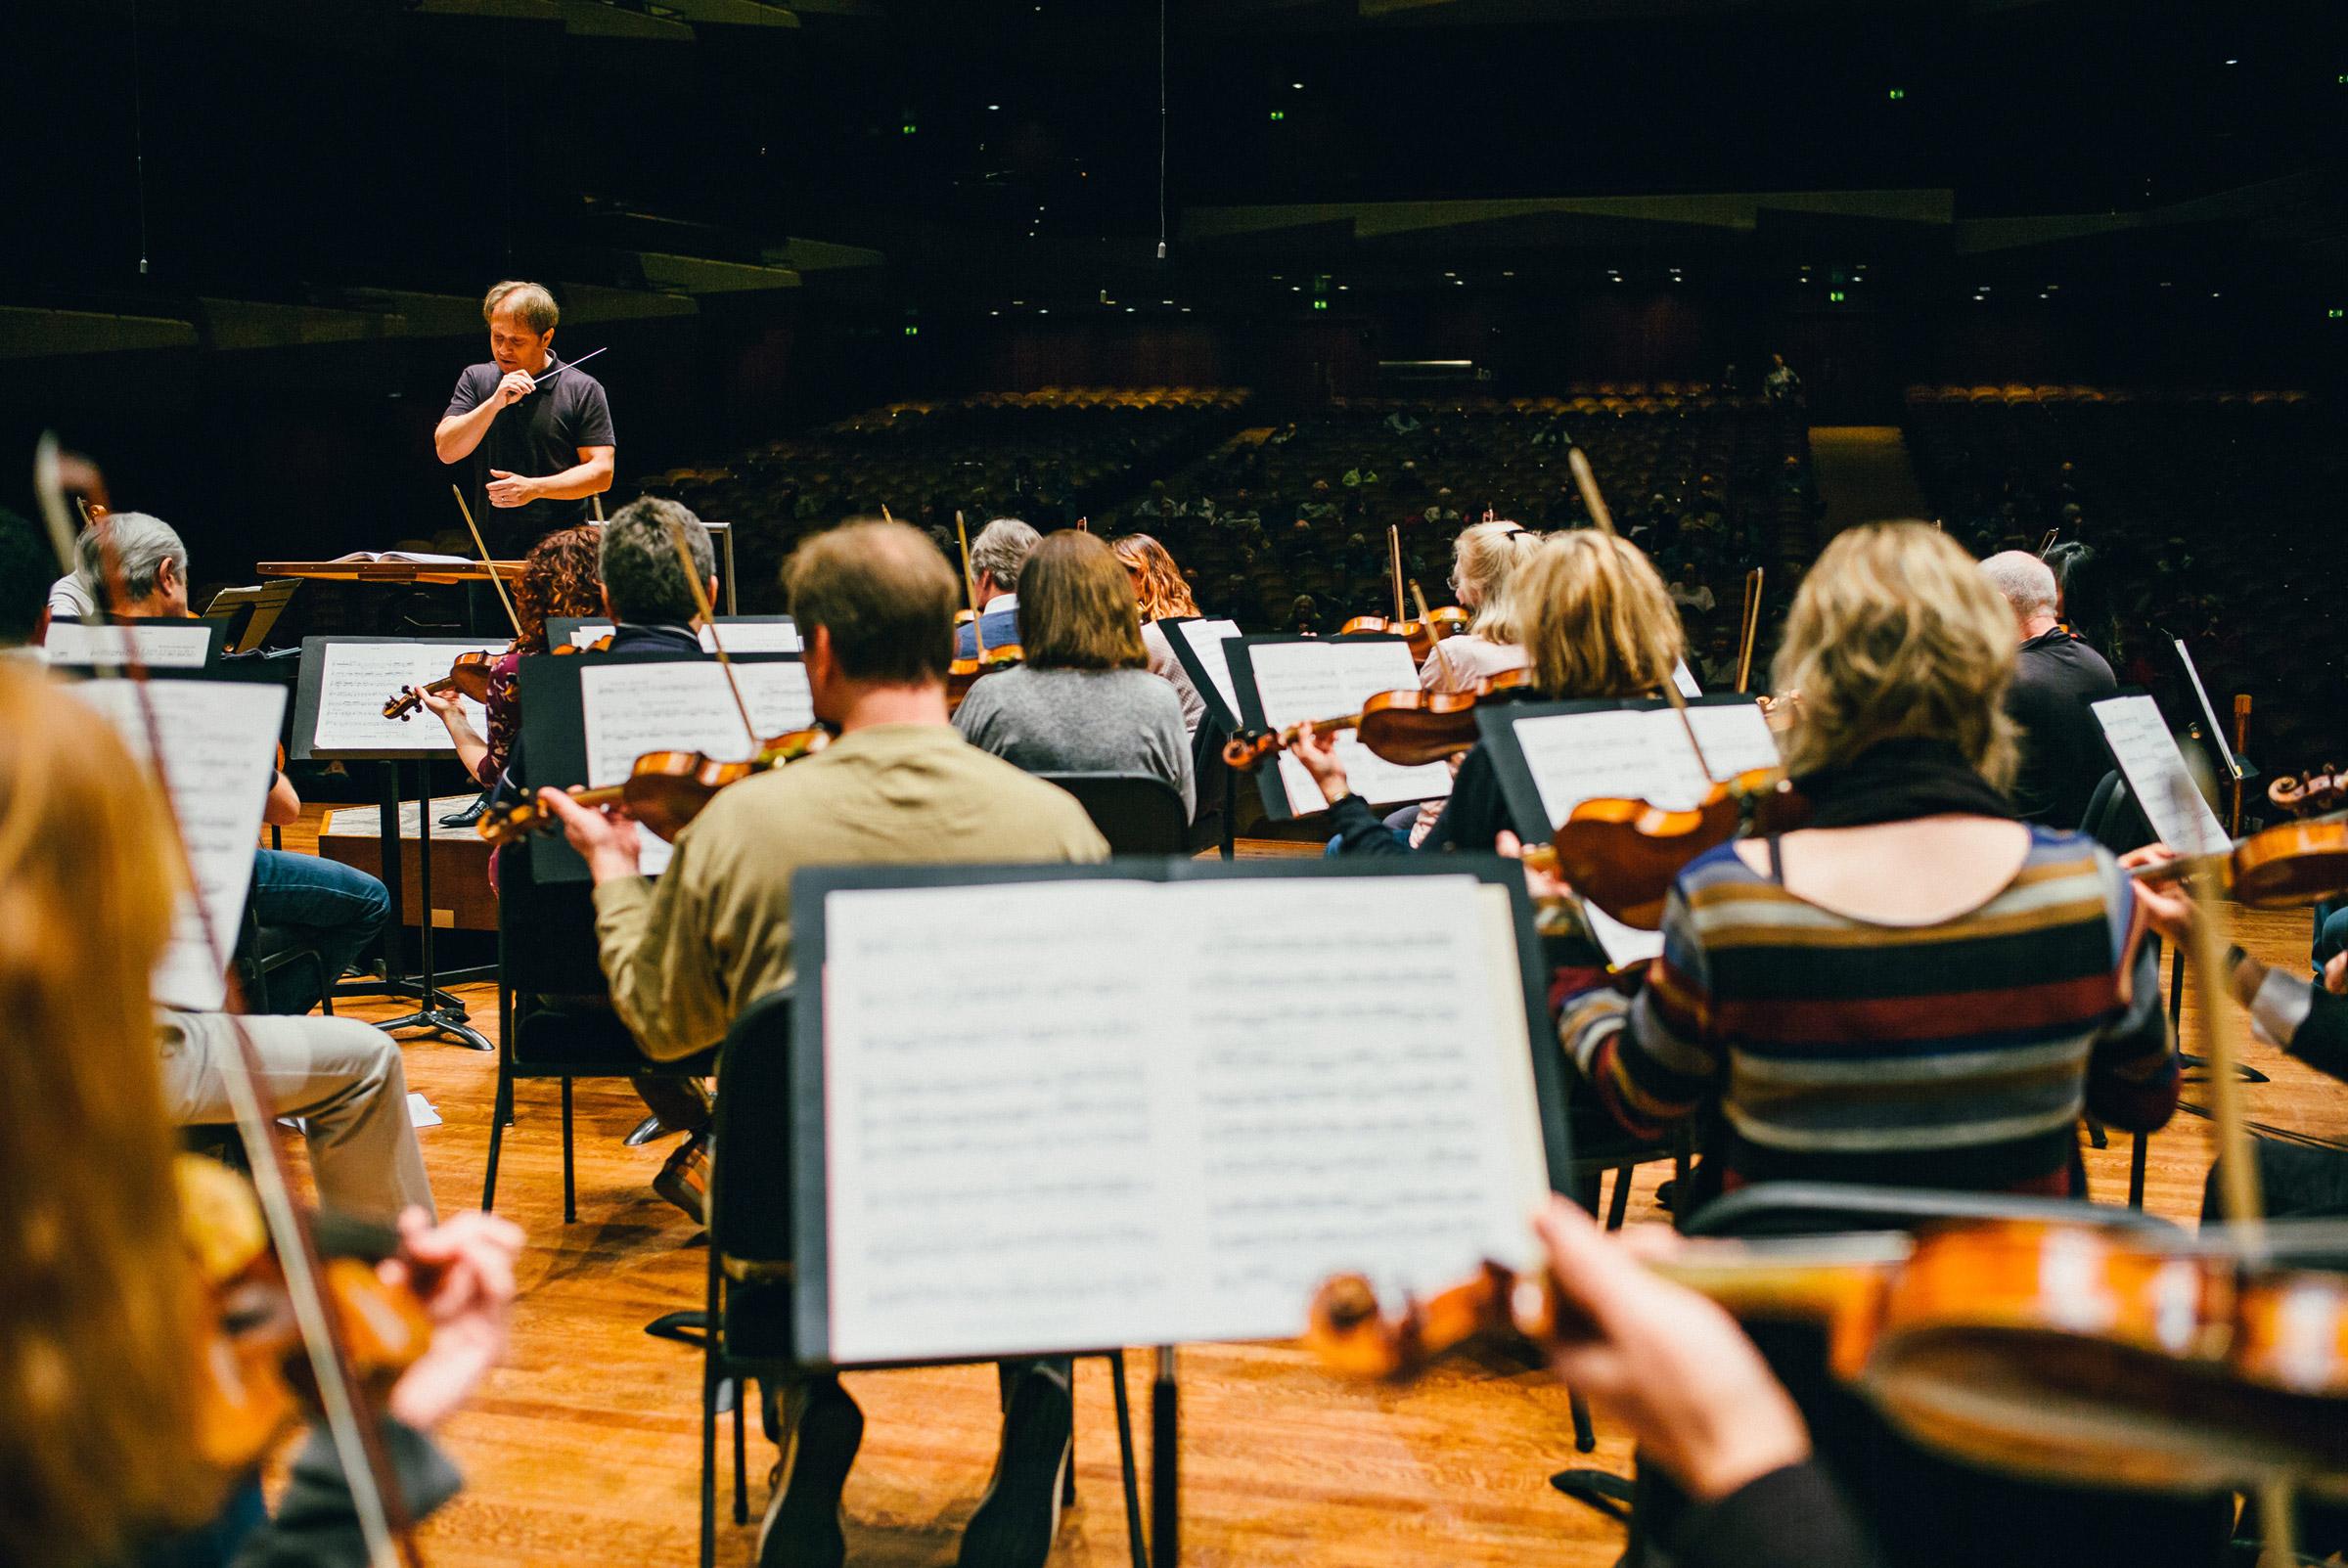 seattle-symphony-orchestra-brandon-patoc-rehearsal-ludovic-morlot-01.JPG